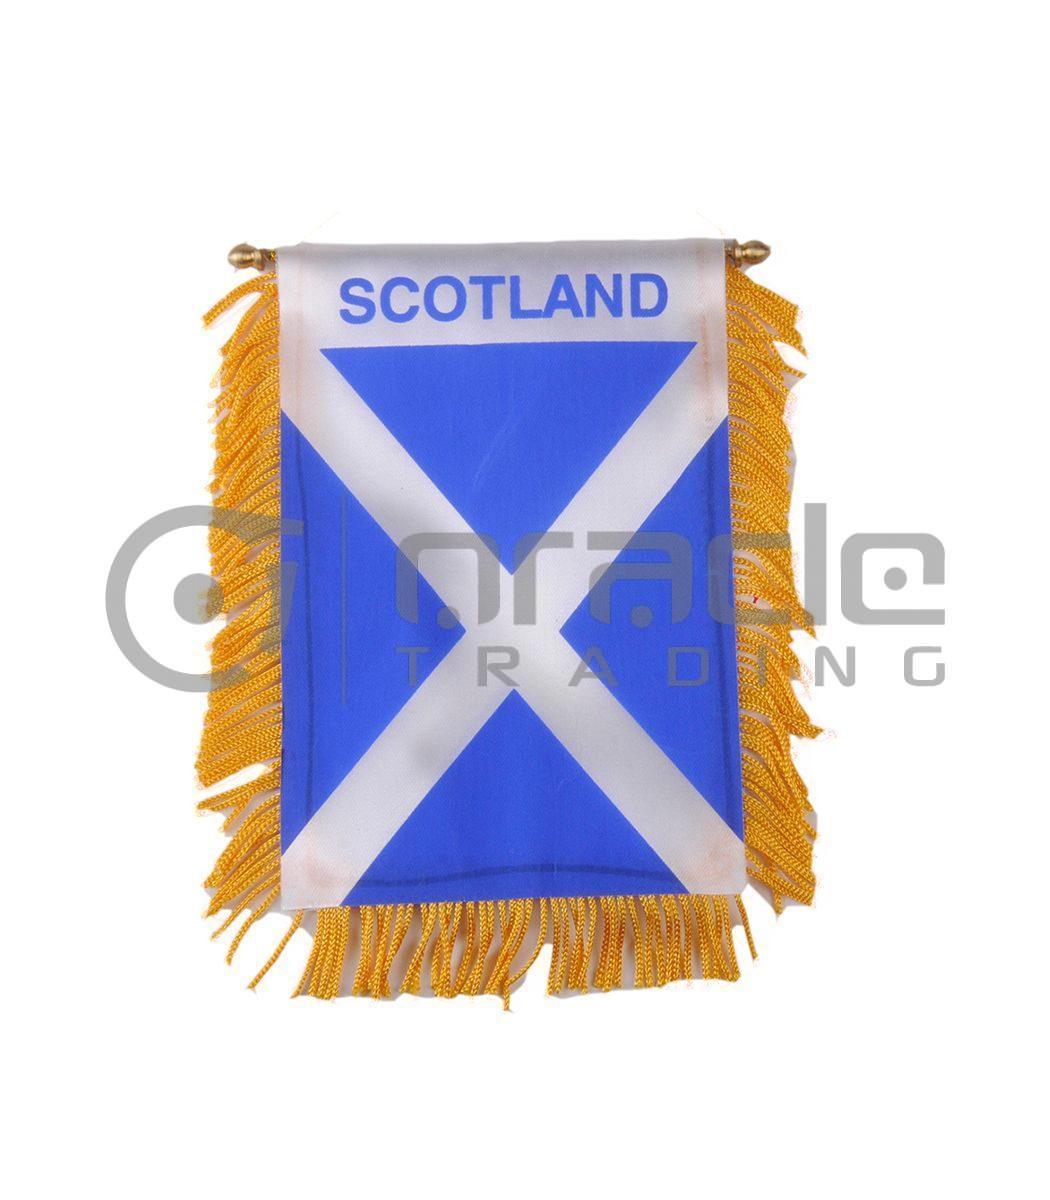 Scotland Mini Banner (St. Andrew's Cross)